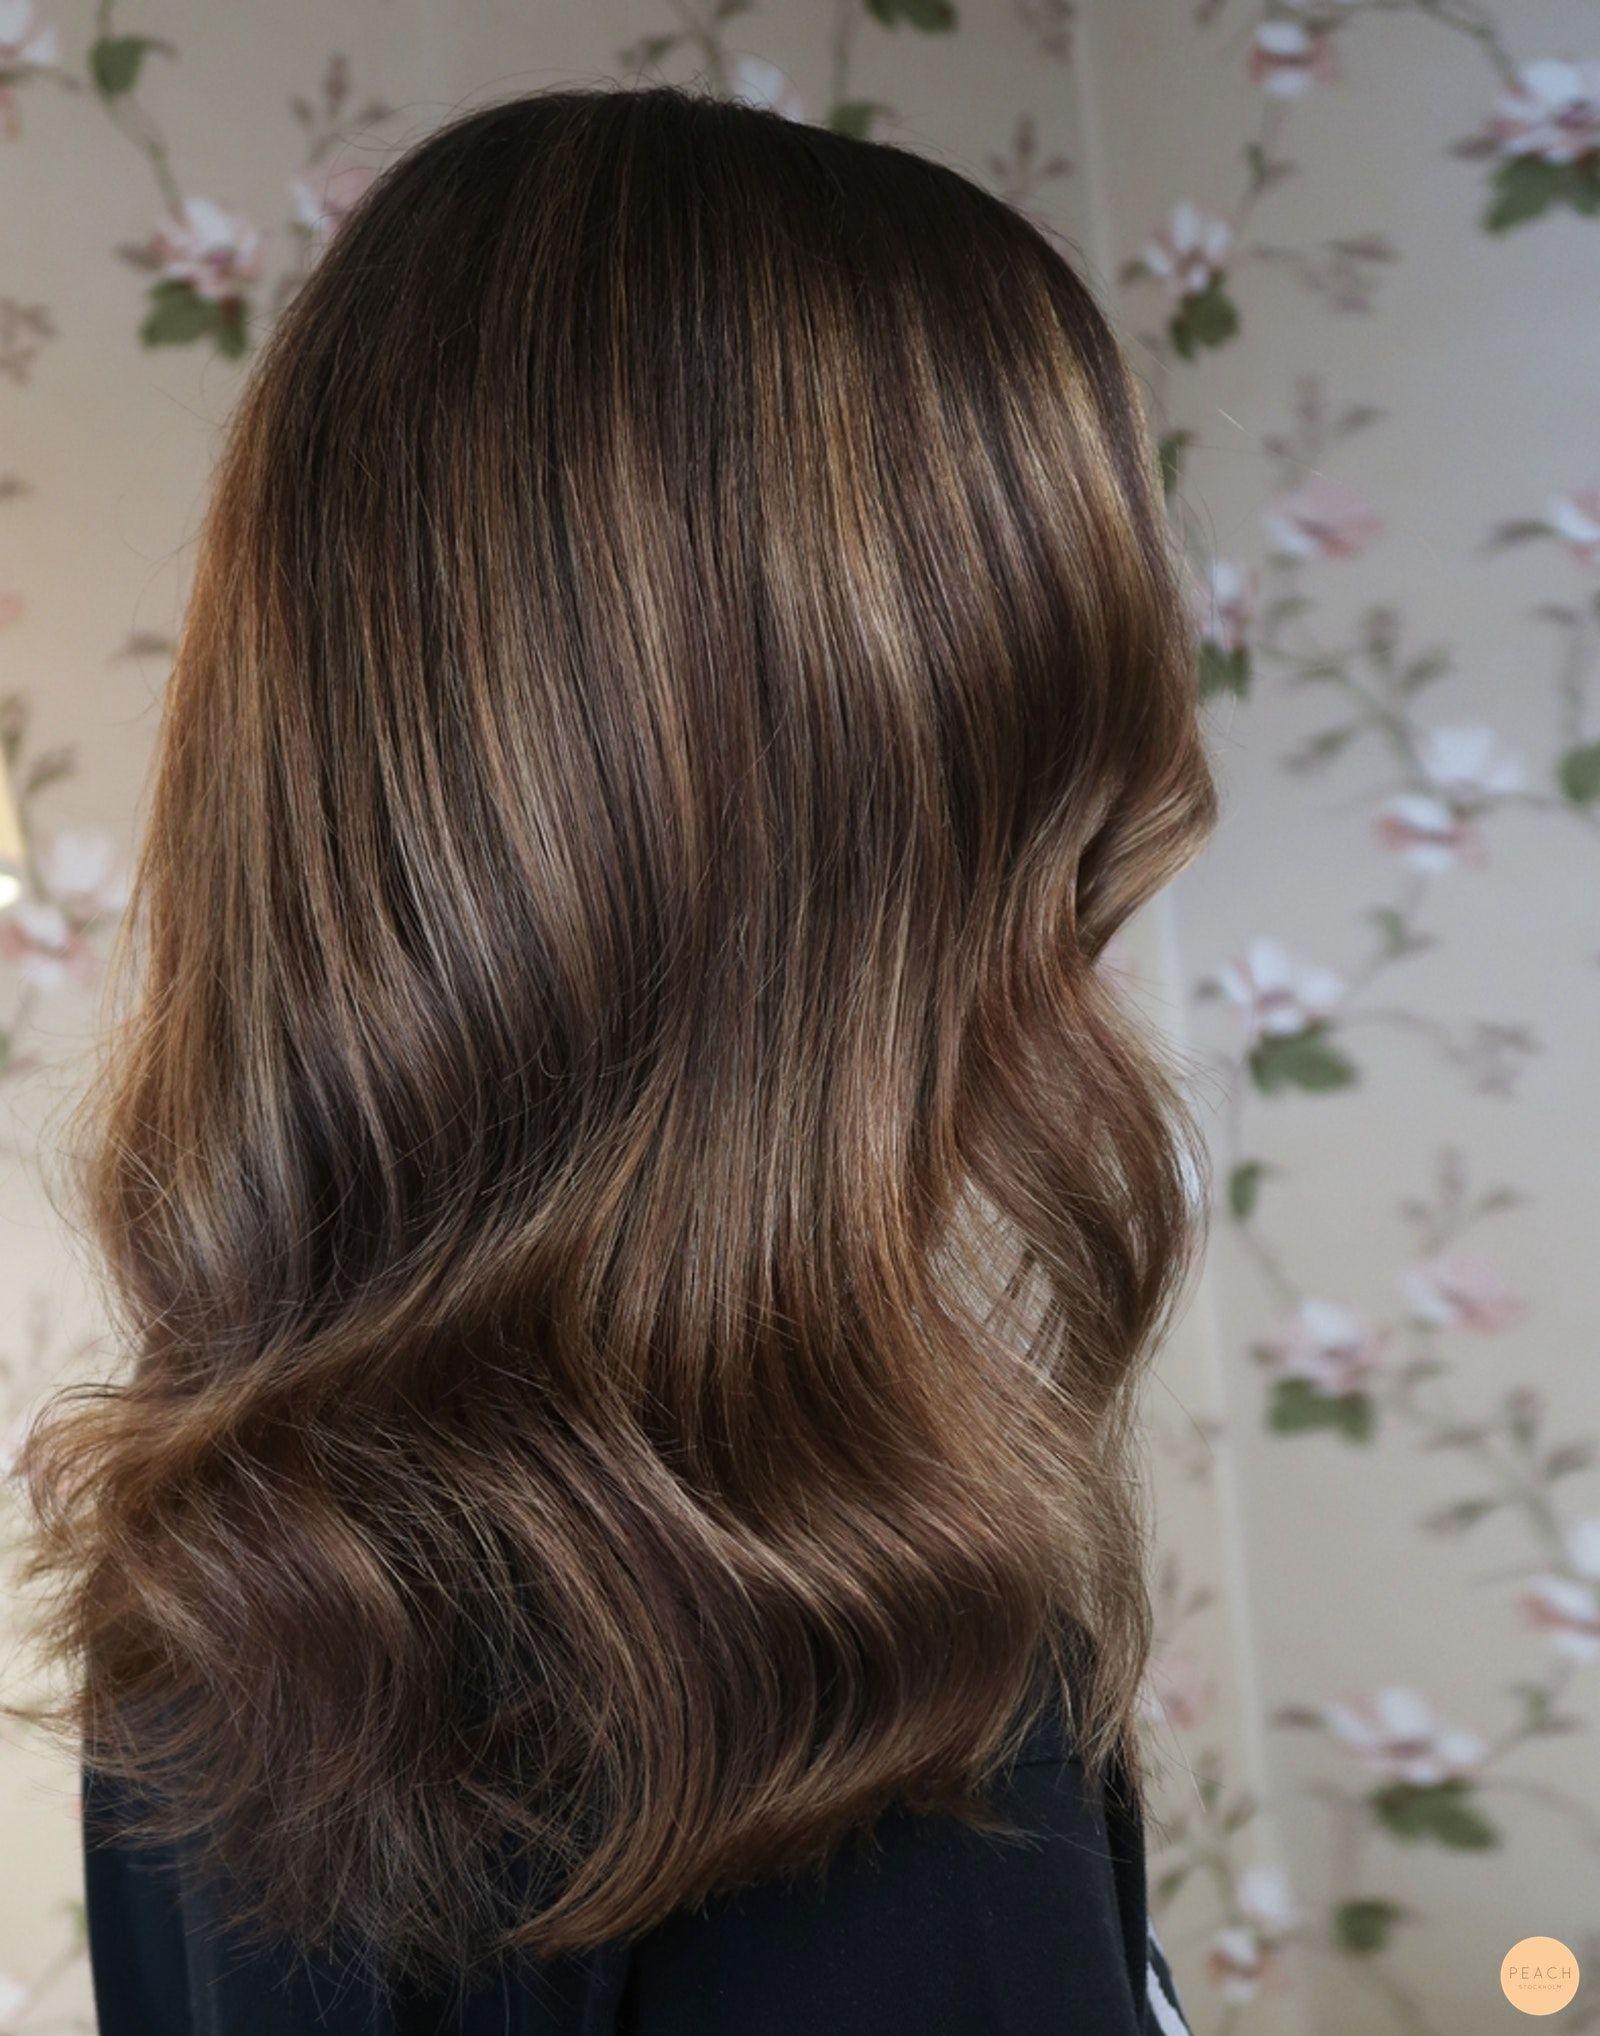 chokladbrunt hår med slingor